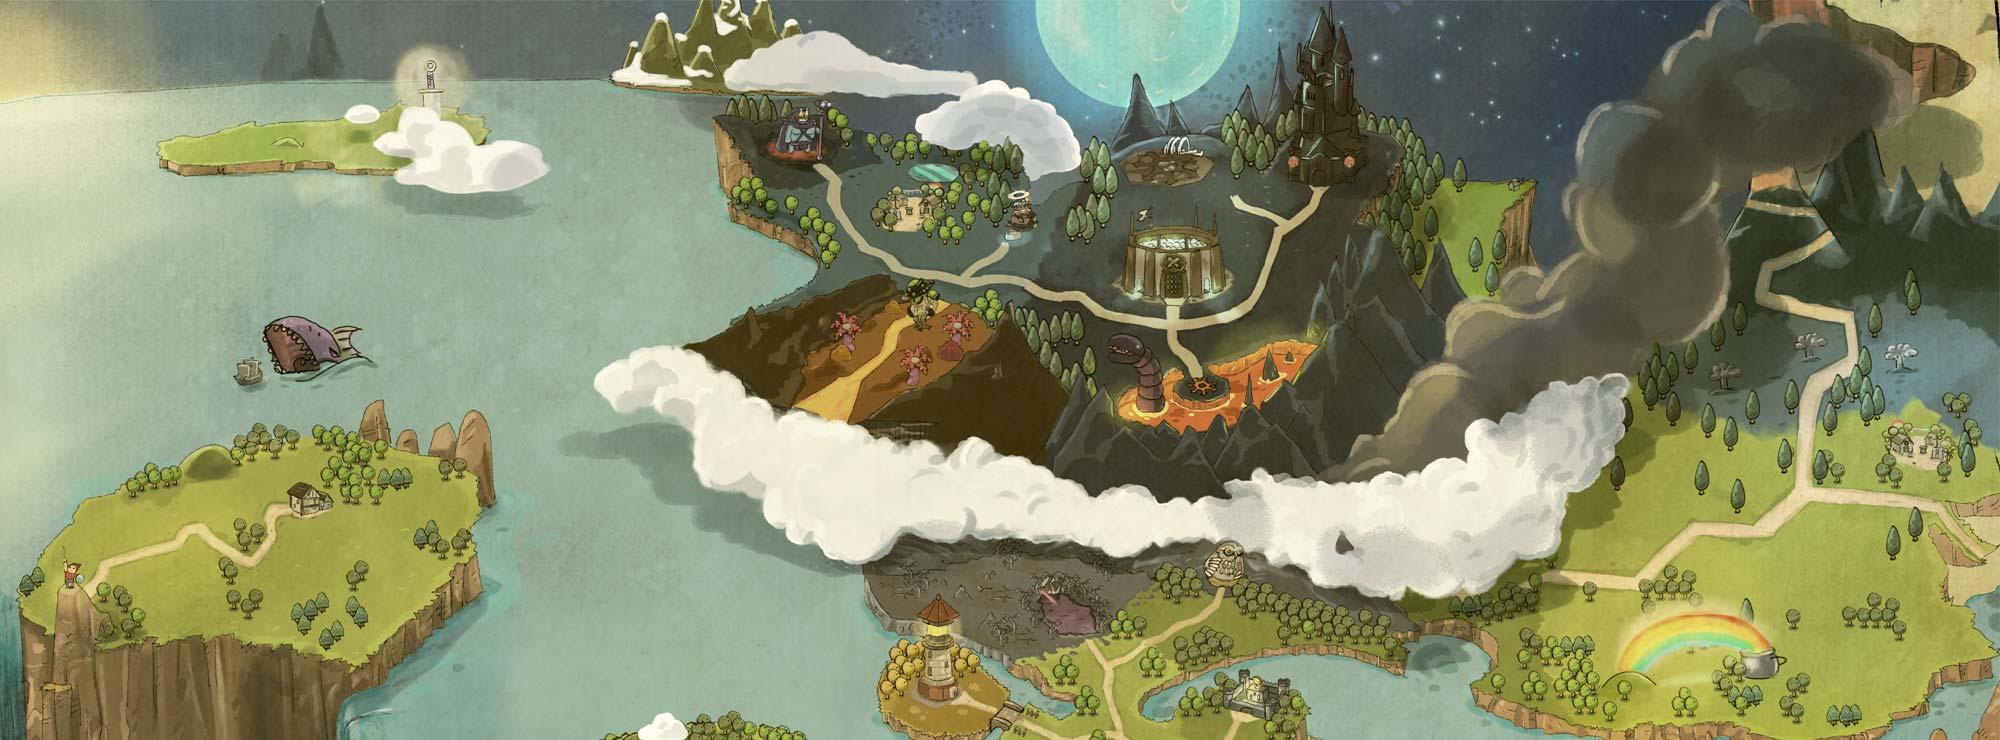 Darkmoor RPG Character Generator